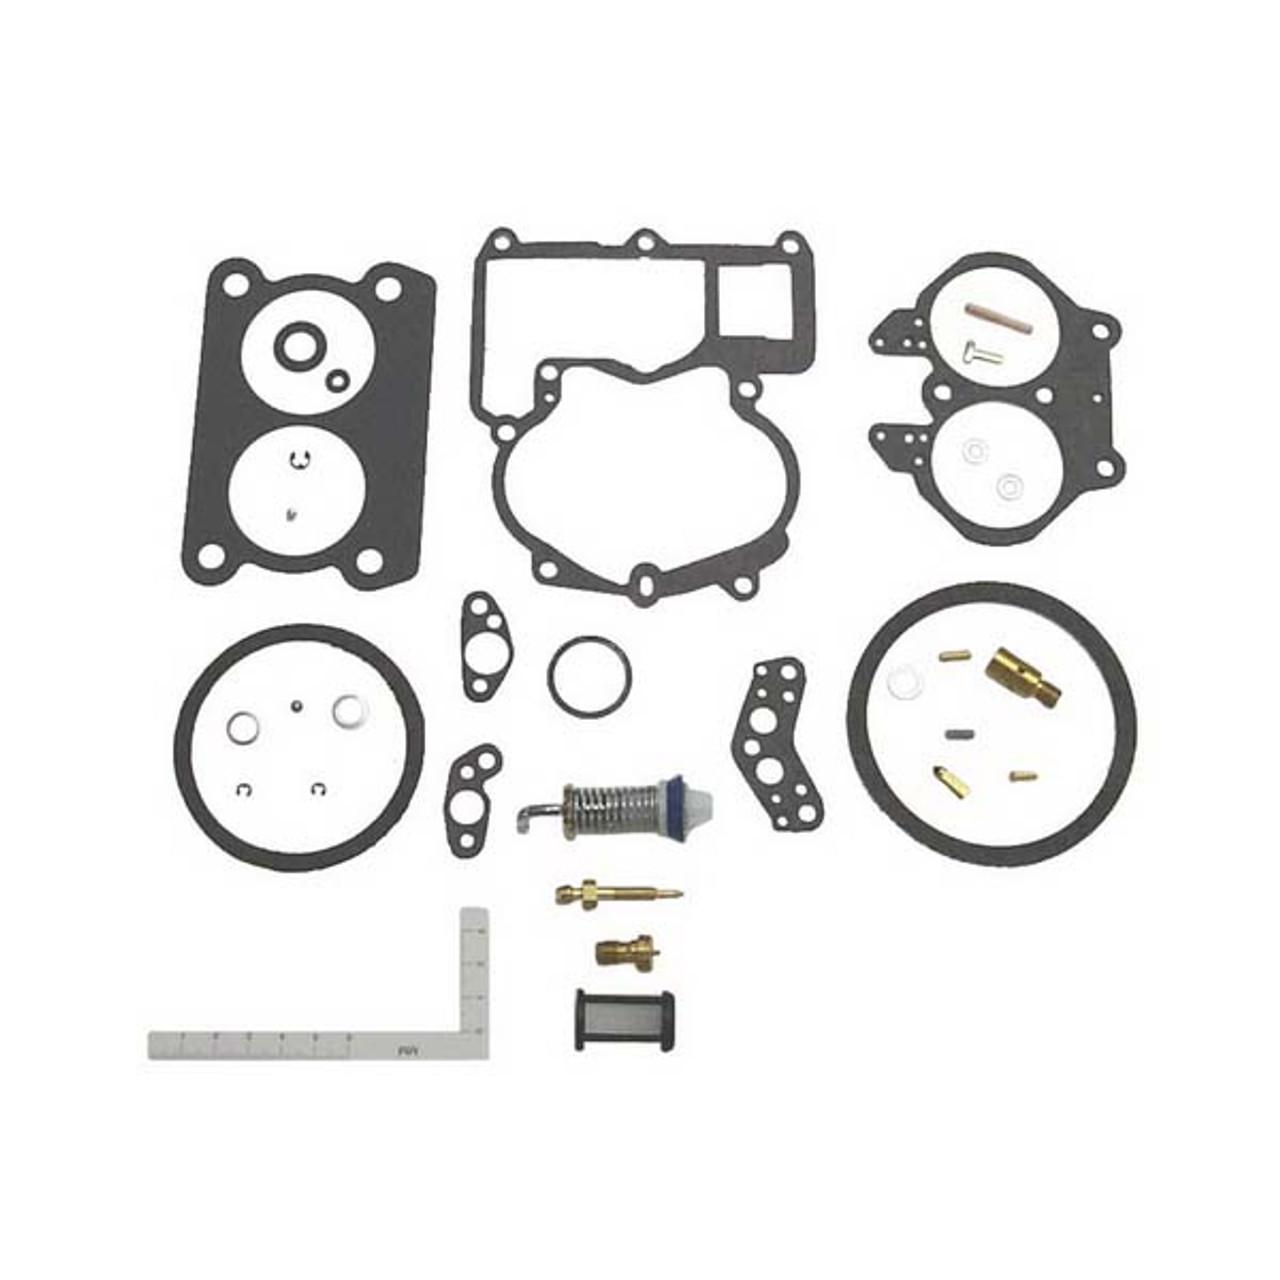 Sierra International 18-7097 Carburetor Kit